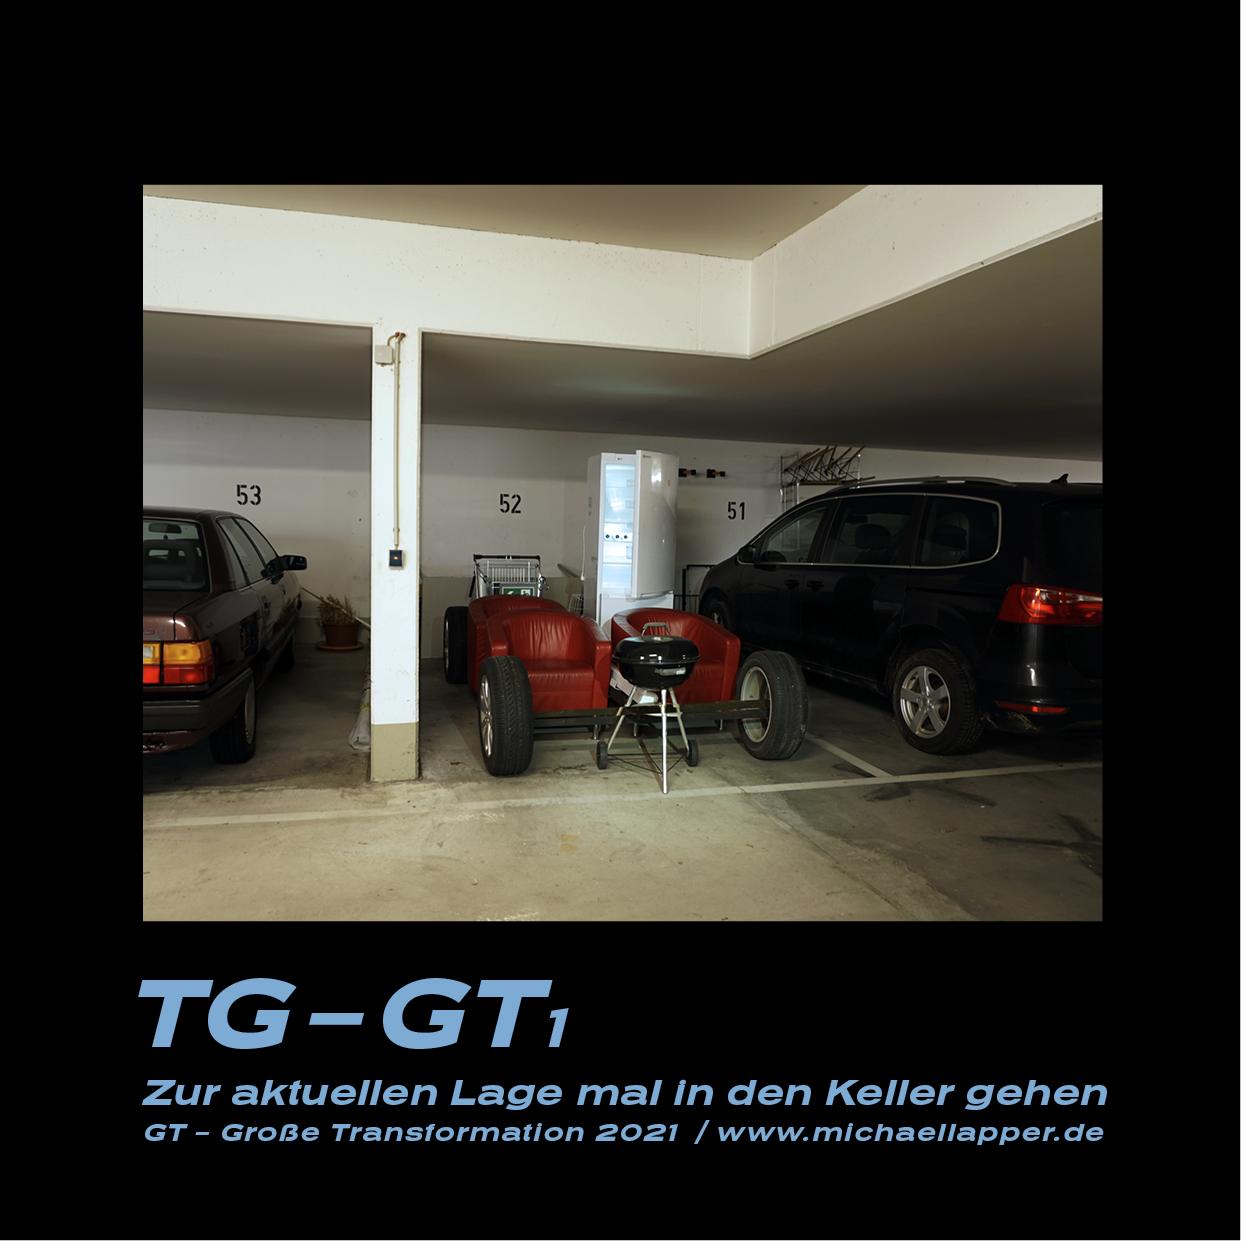 TG_GT_1